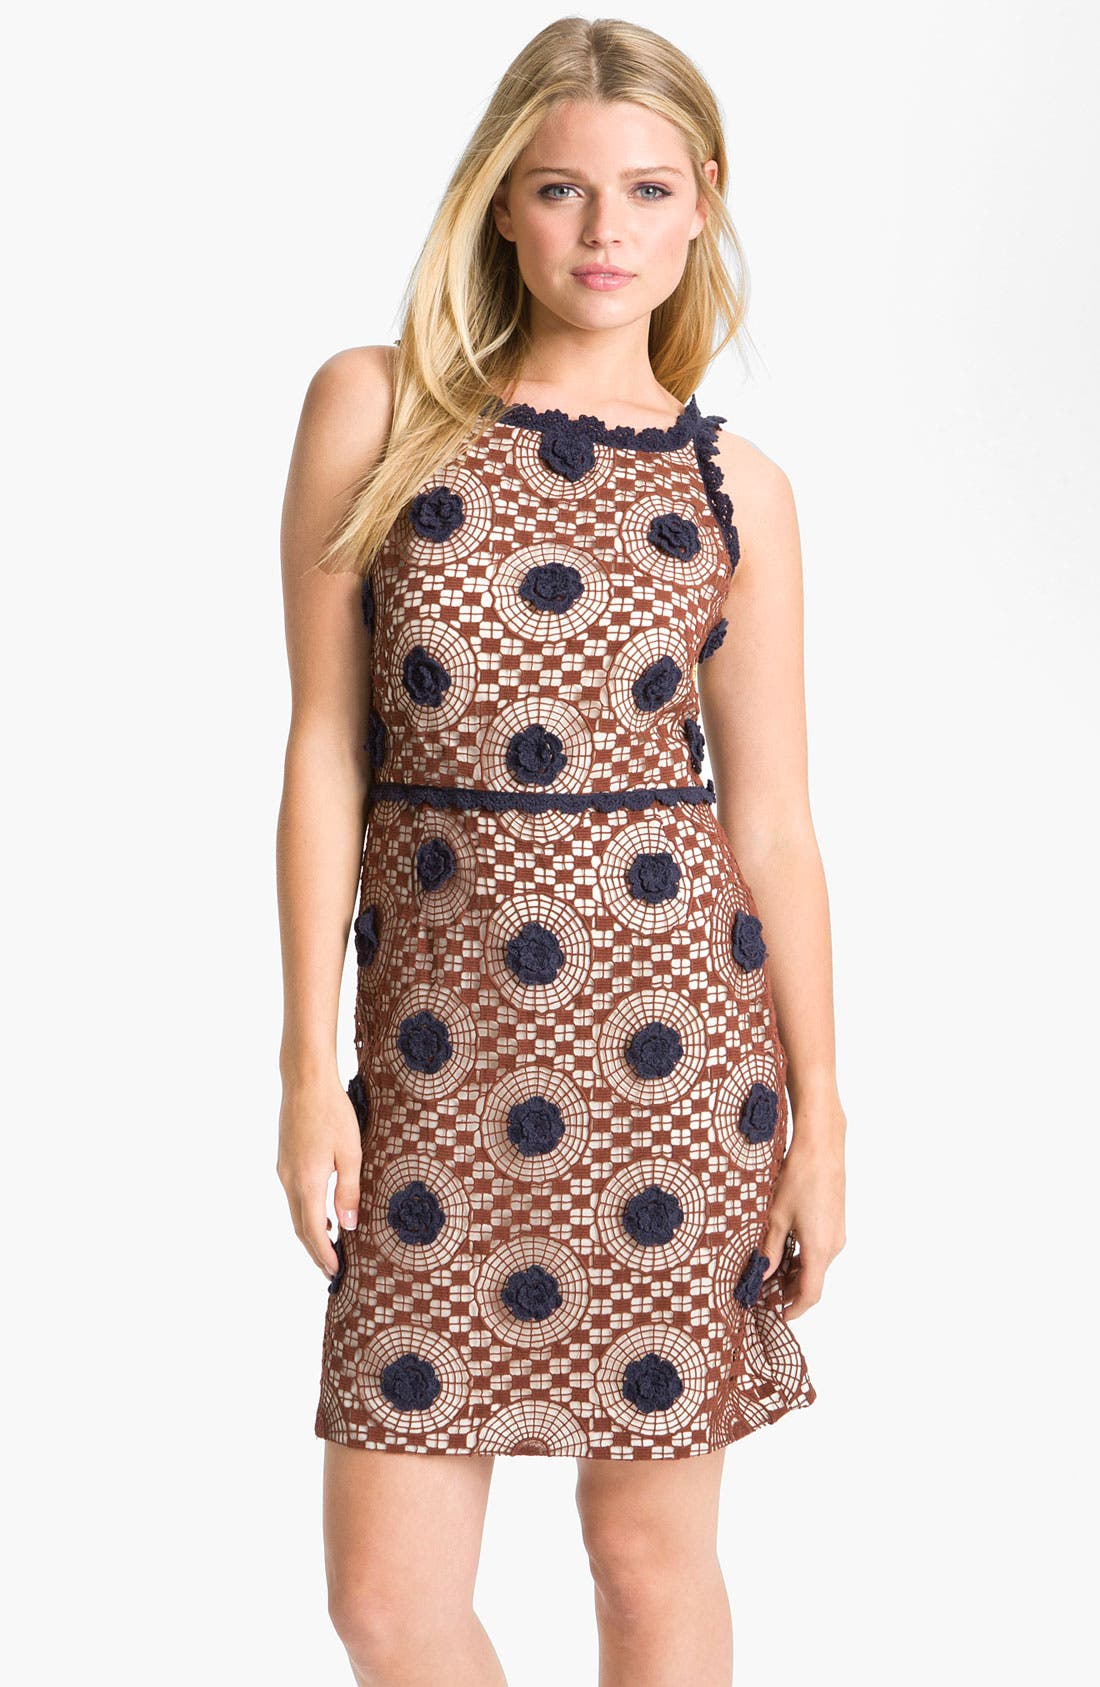 Alternate Image 1 Selected - Tory Burch 'Sally' Sleeveless Sheath Dress